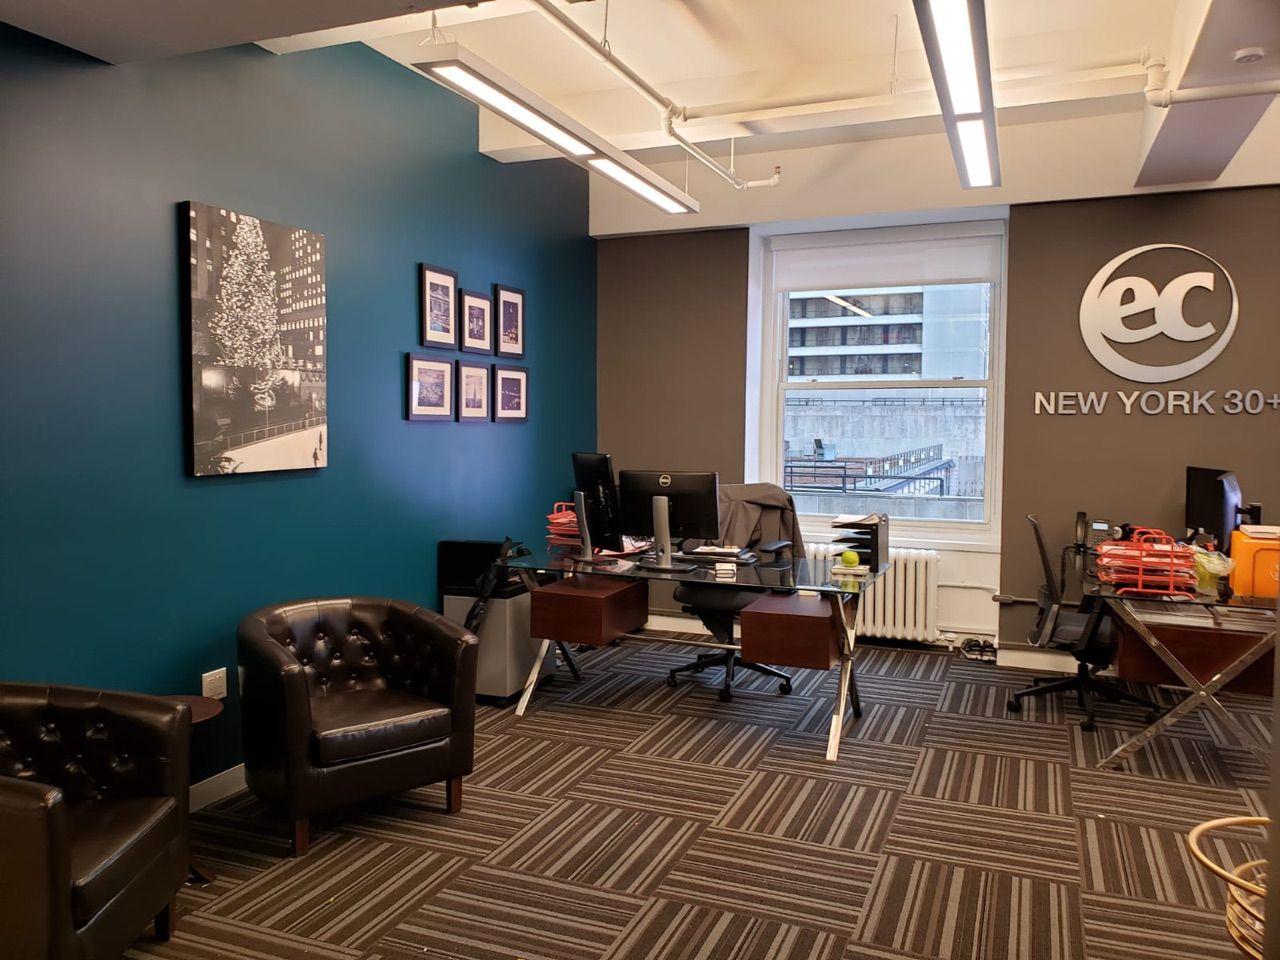 Learn English in New York – NY English School - EC New York